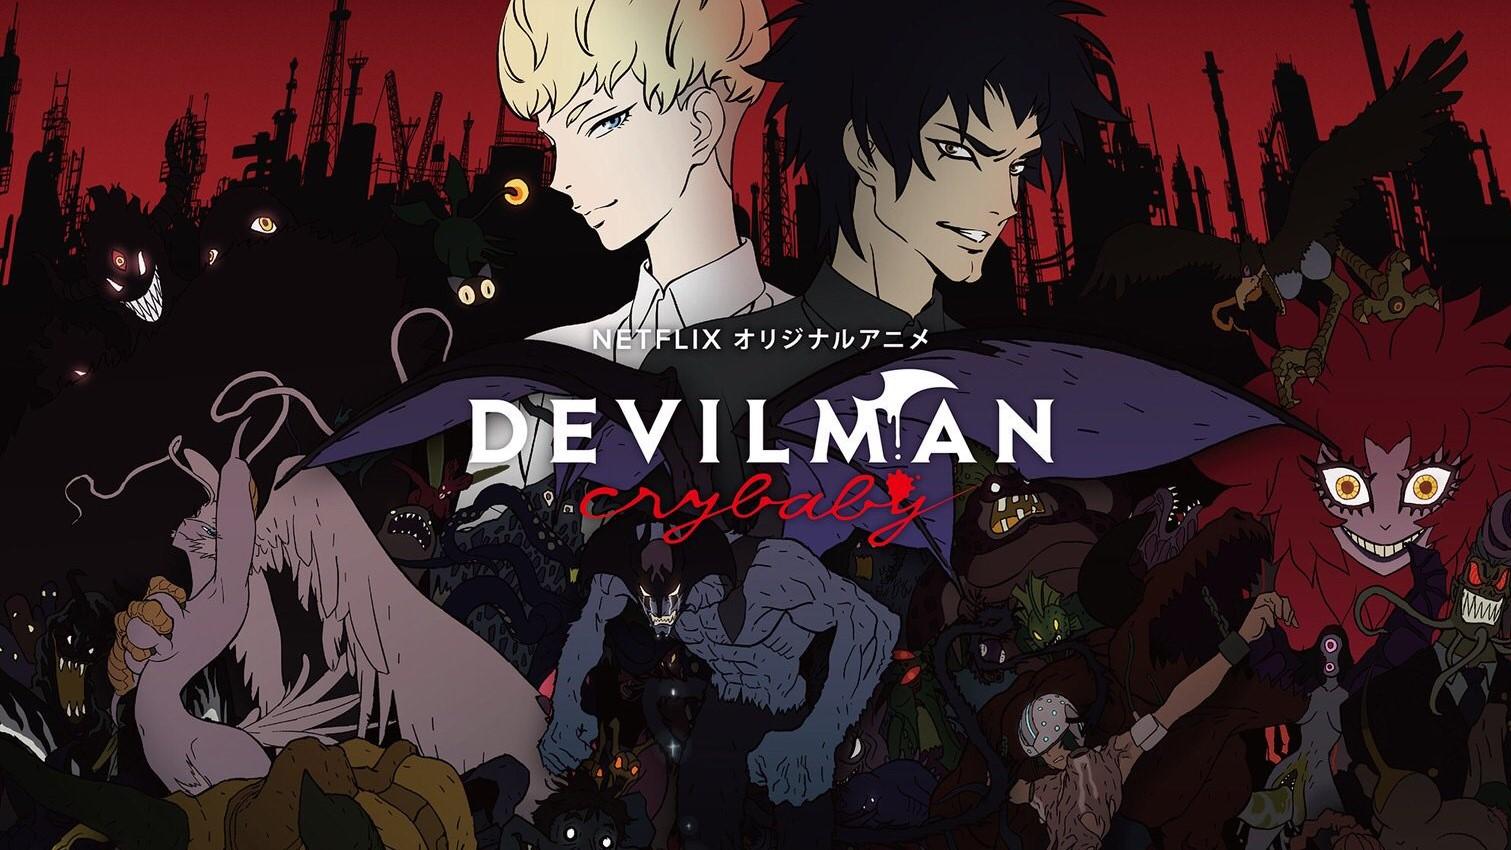 devilman-crybaby-resenha-poster